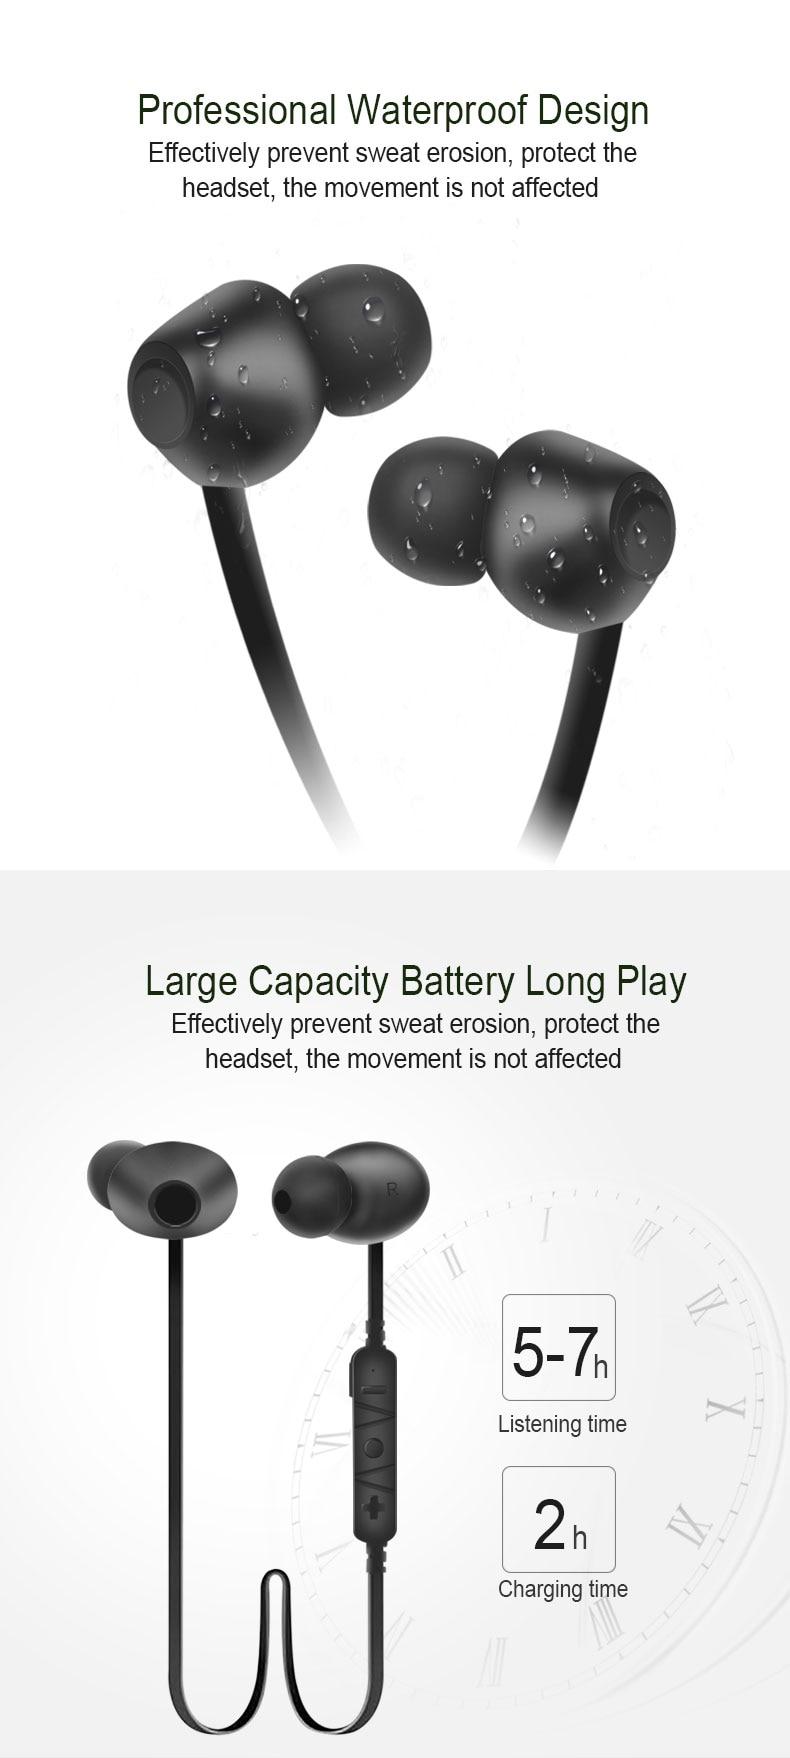 Moonliness Wireless Bluetooth Mini Earphones Sport Running Headsets HiFi Stereo Handsfree Earphone for Sweatproof Music with MIC